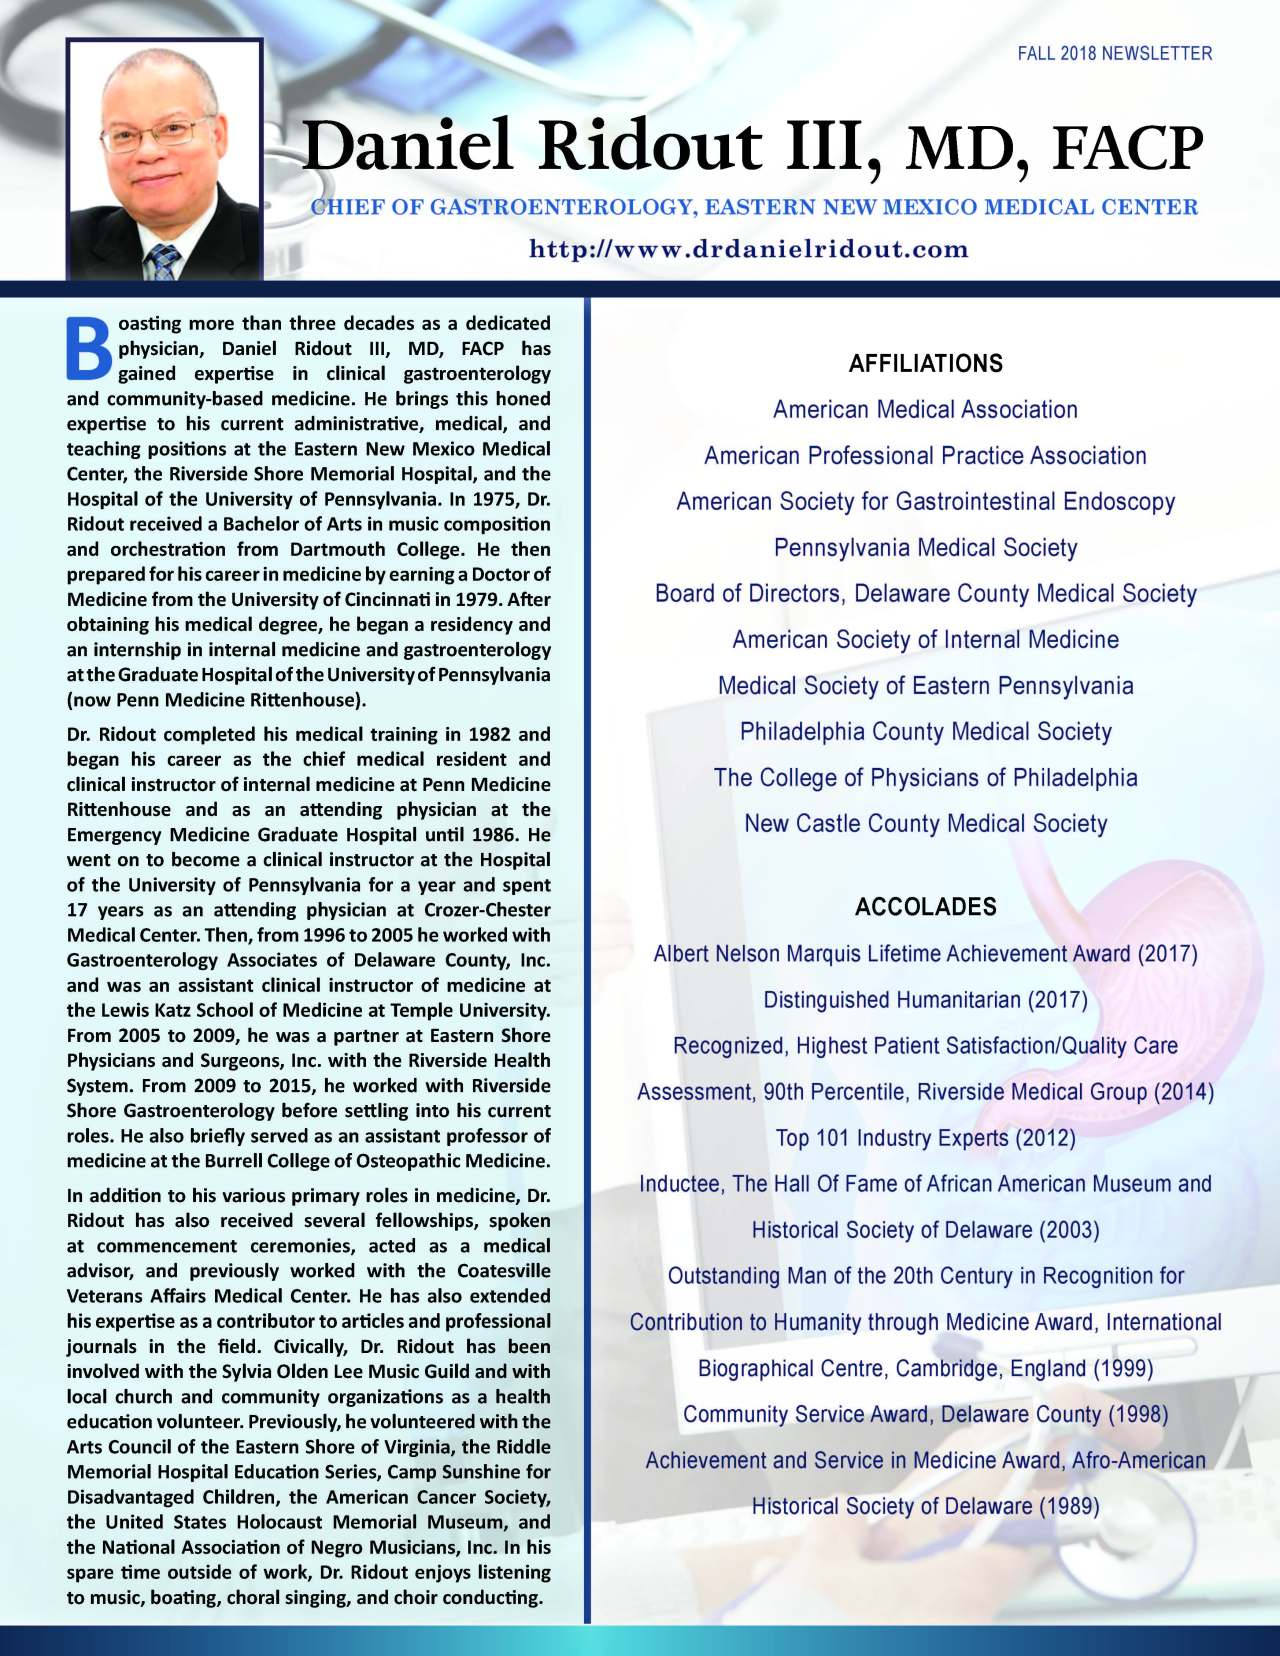 Ridout, Daniel 993425_24159584 Newsletter